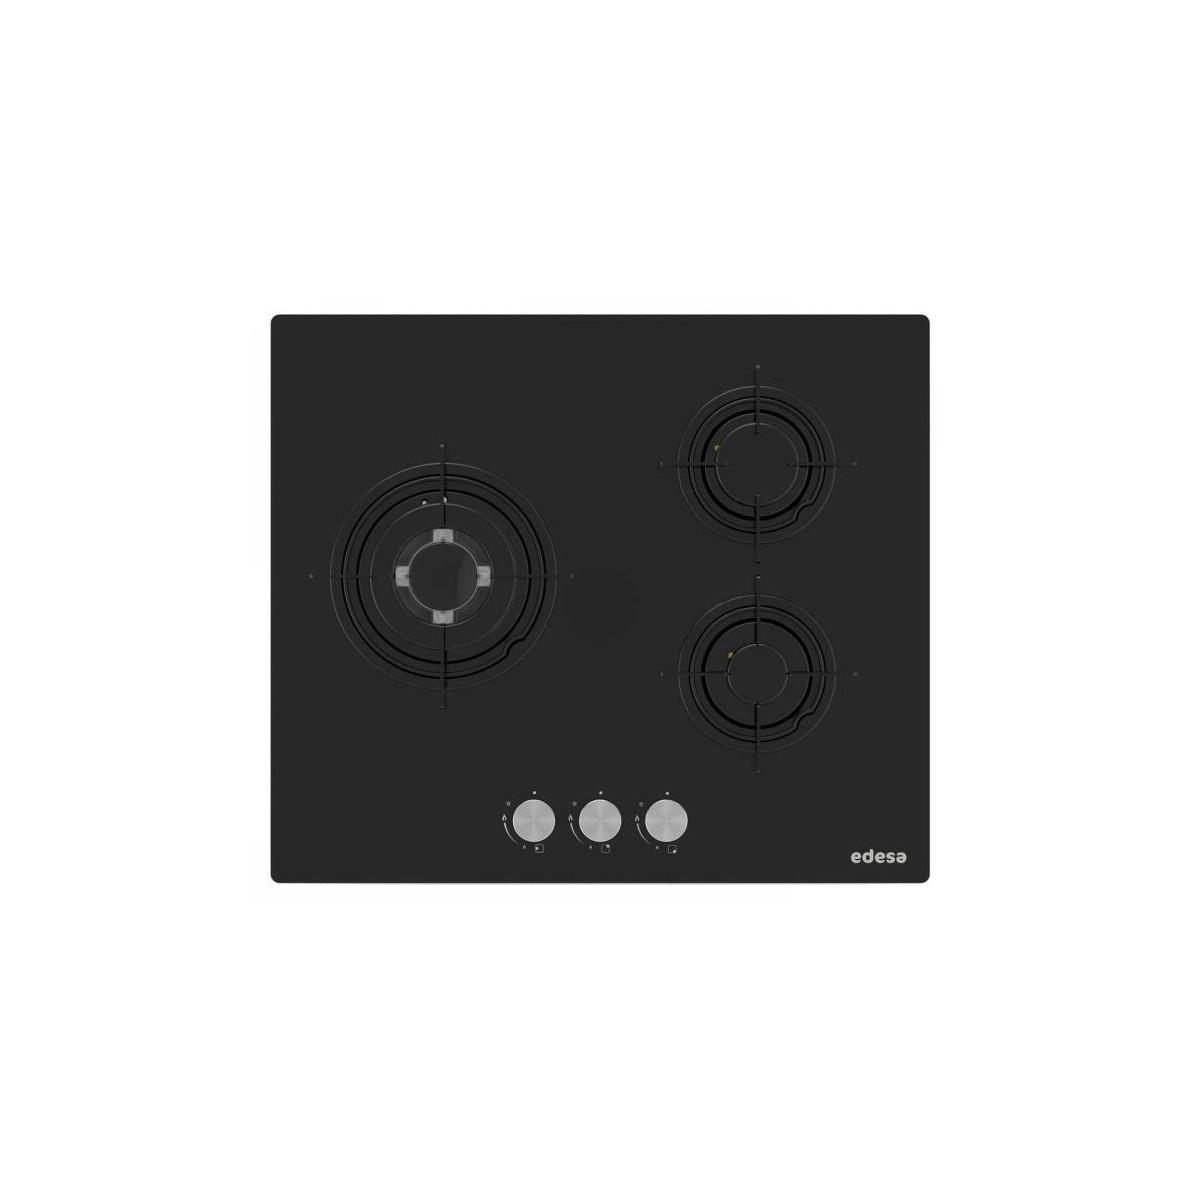 Encimera Edesa EGG6030TIB negro 59cm